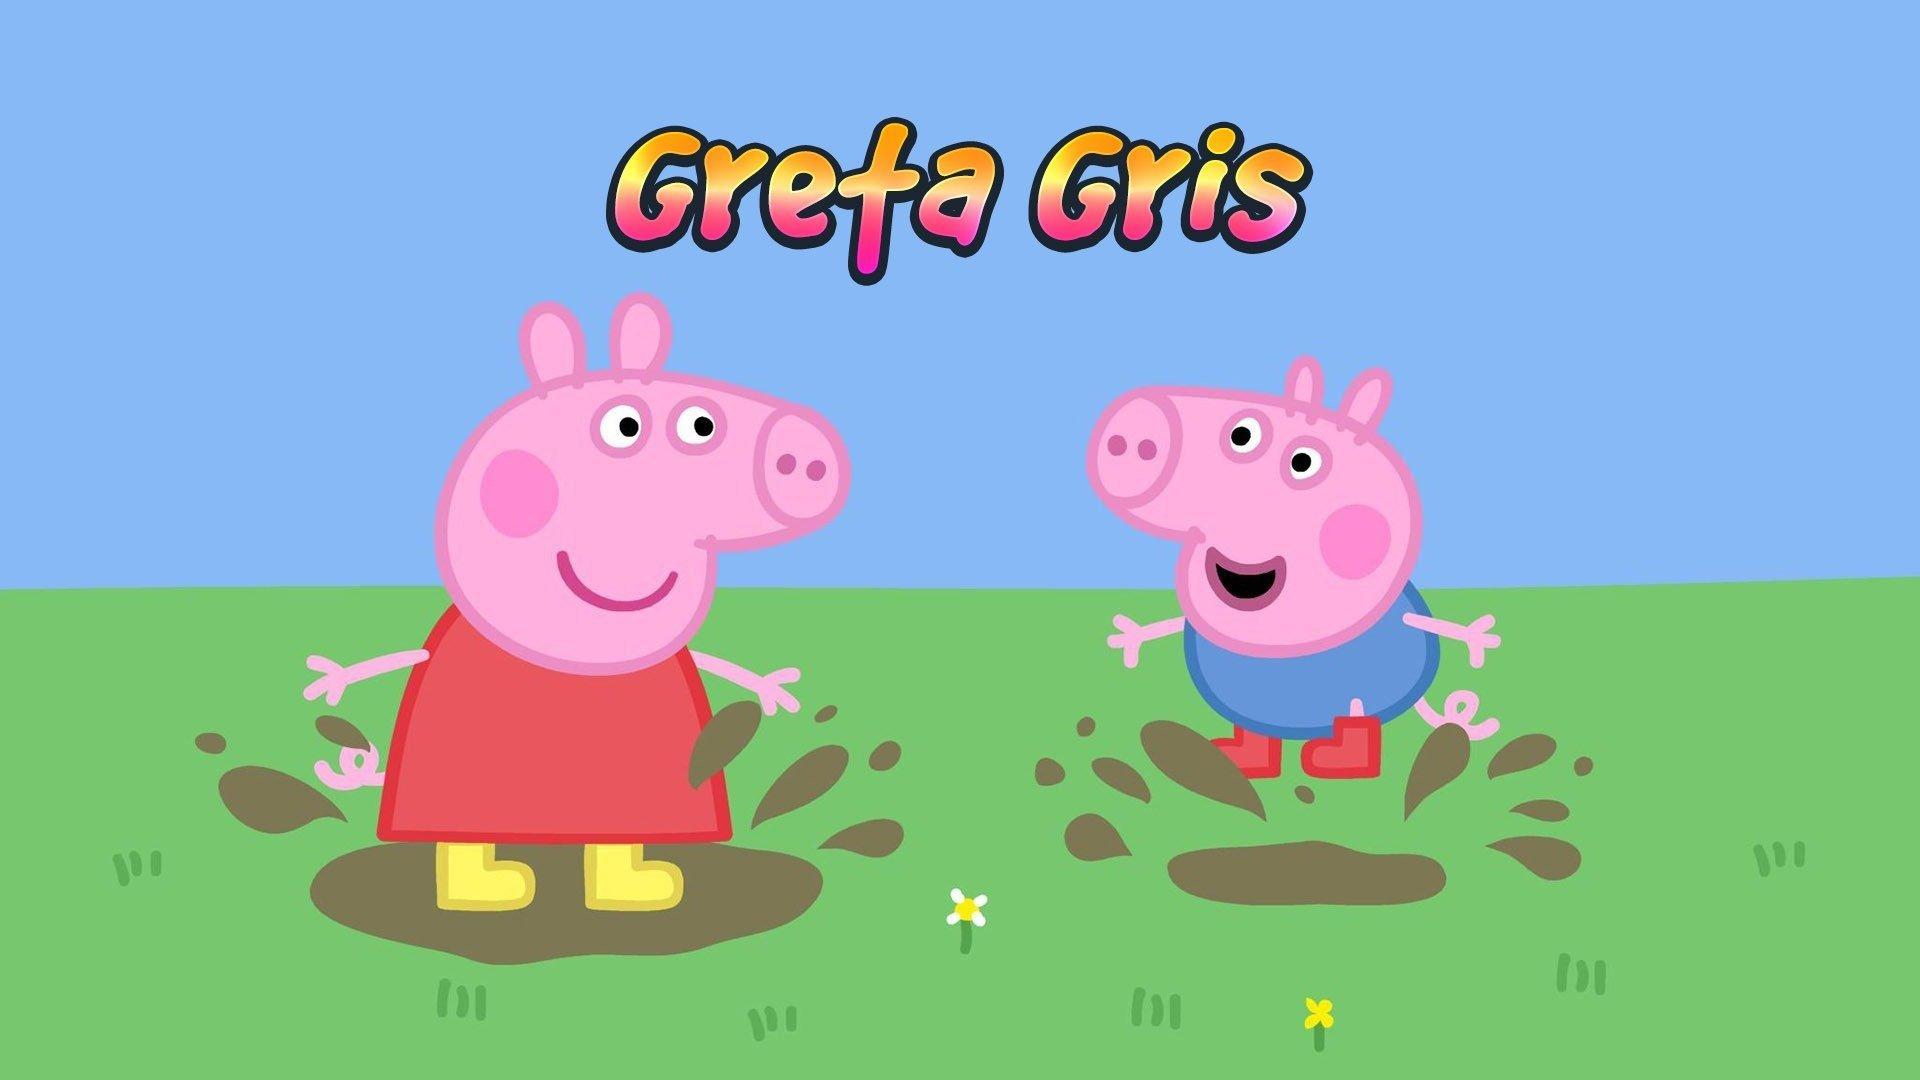 Greta Gris